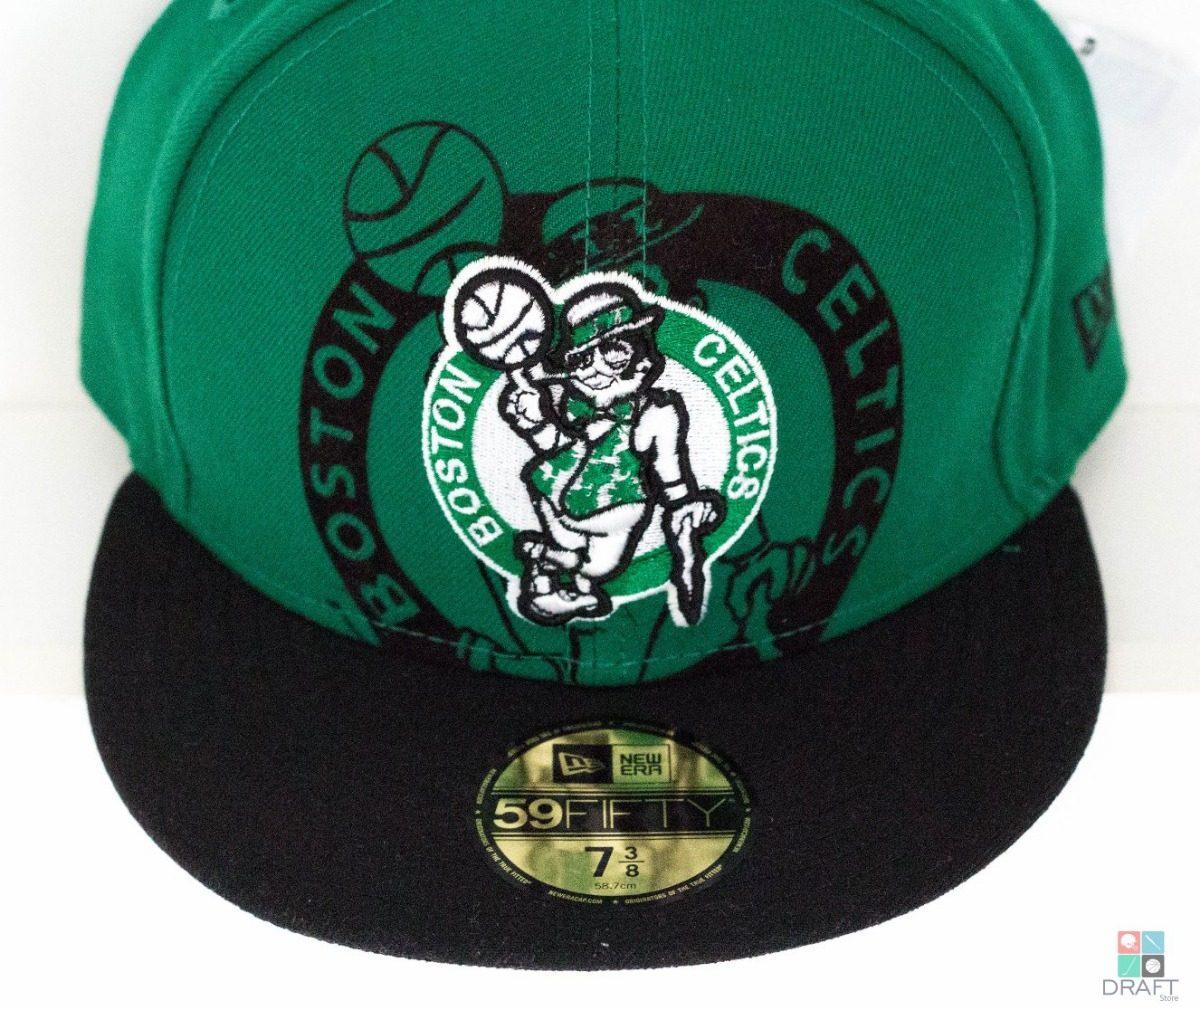 boné aba reta nba boston celtics new era basquete. Carregando zoom... boné  new era. Carregando zoom. 9e4ca40c67c